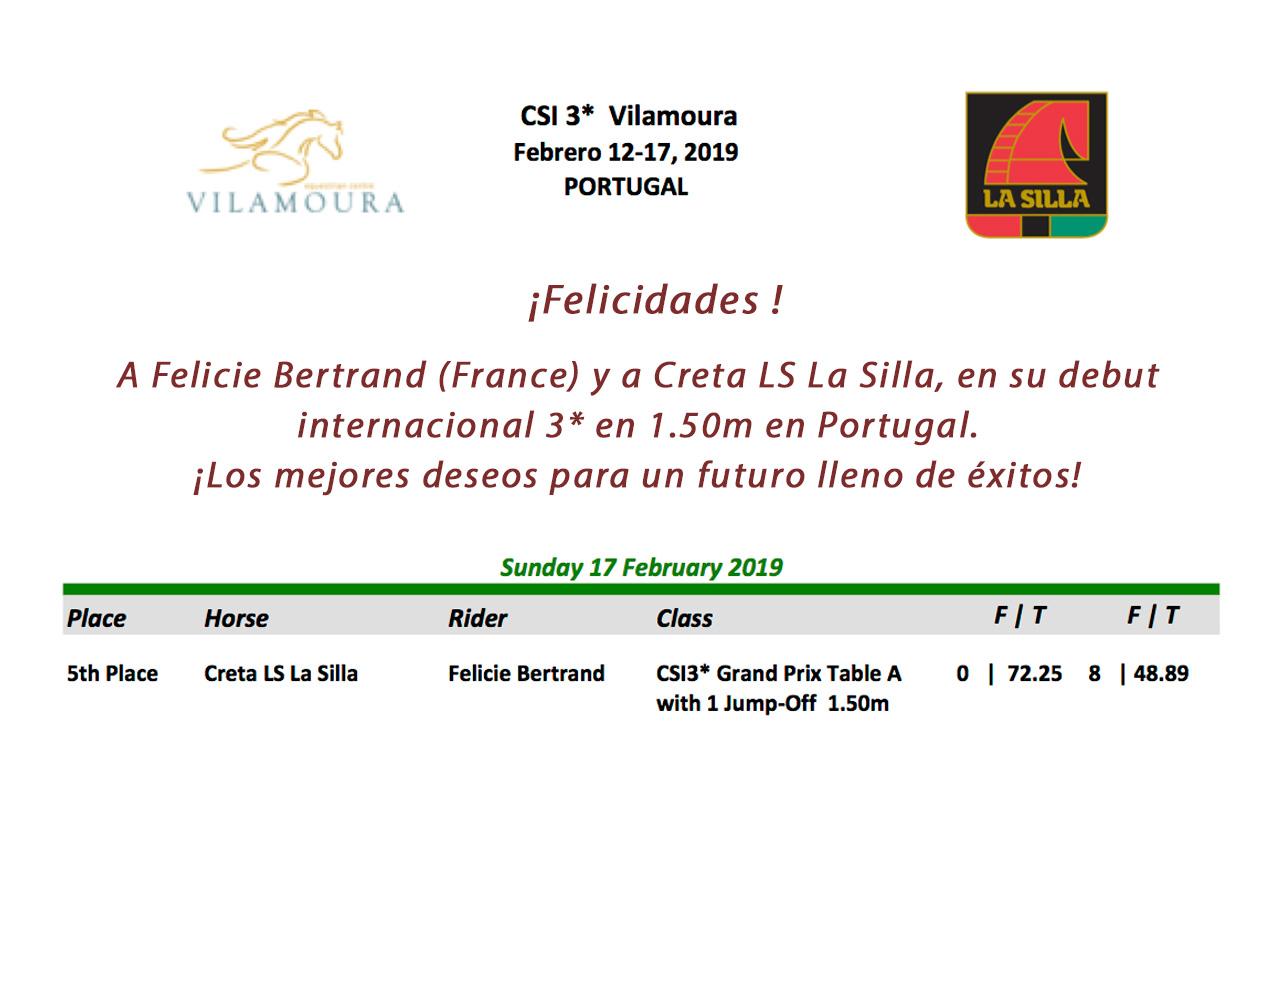 _CSI-3-Vilamoura--Feb-12-17-PORTUGAL-2